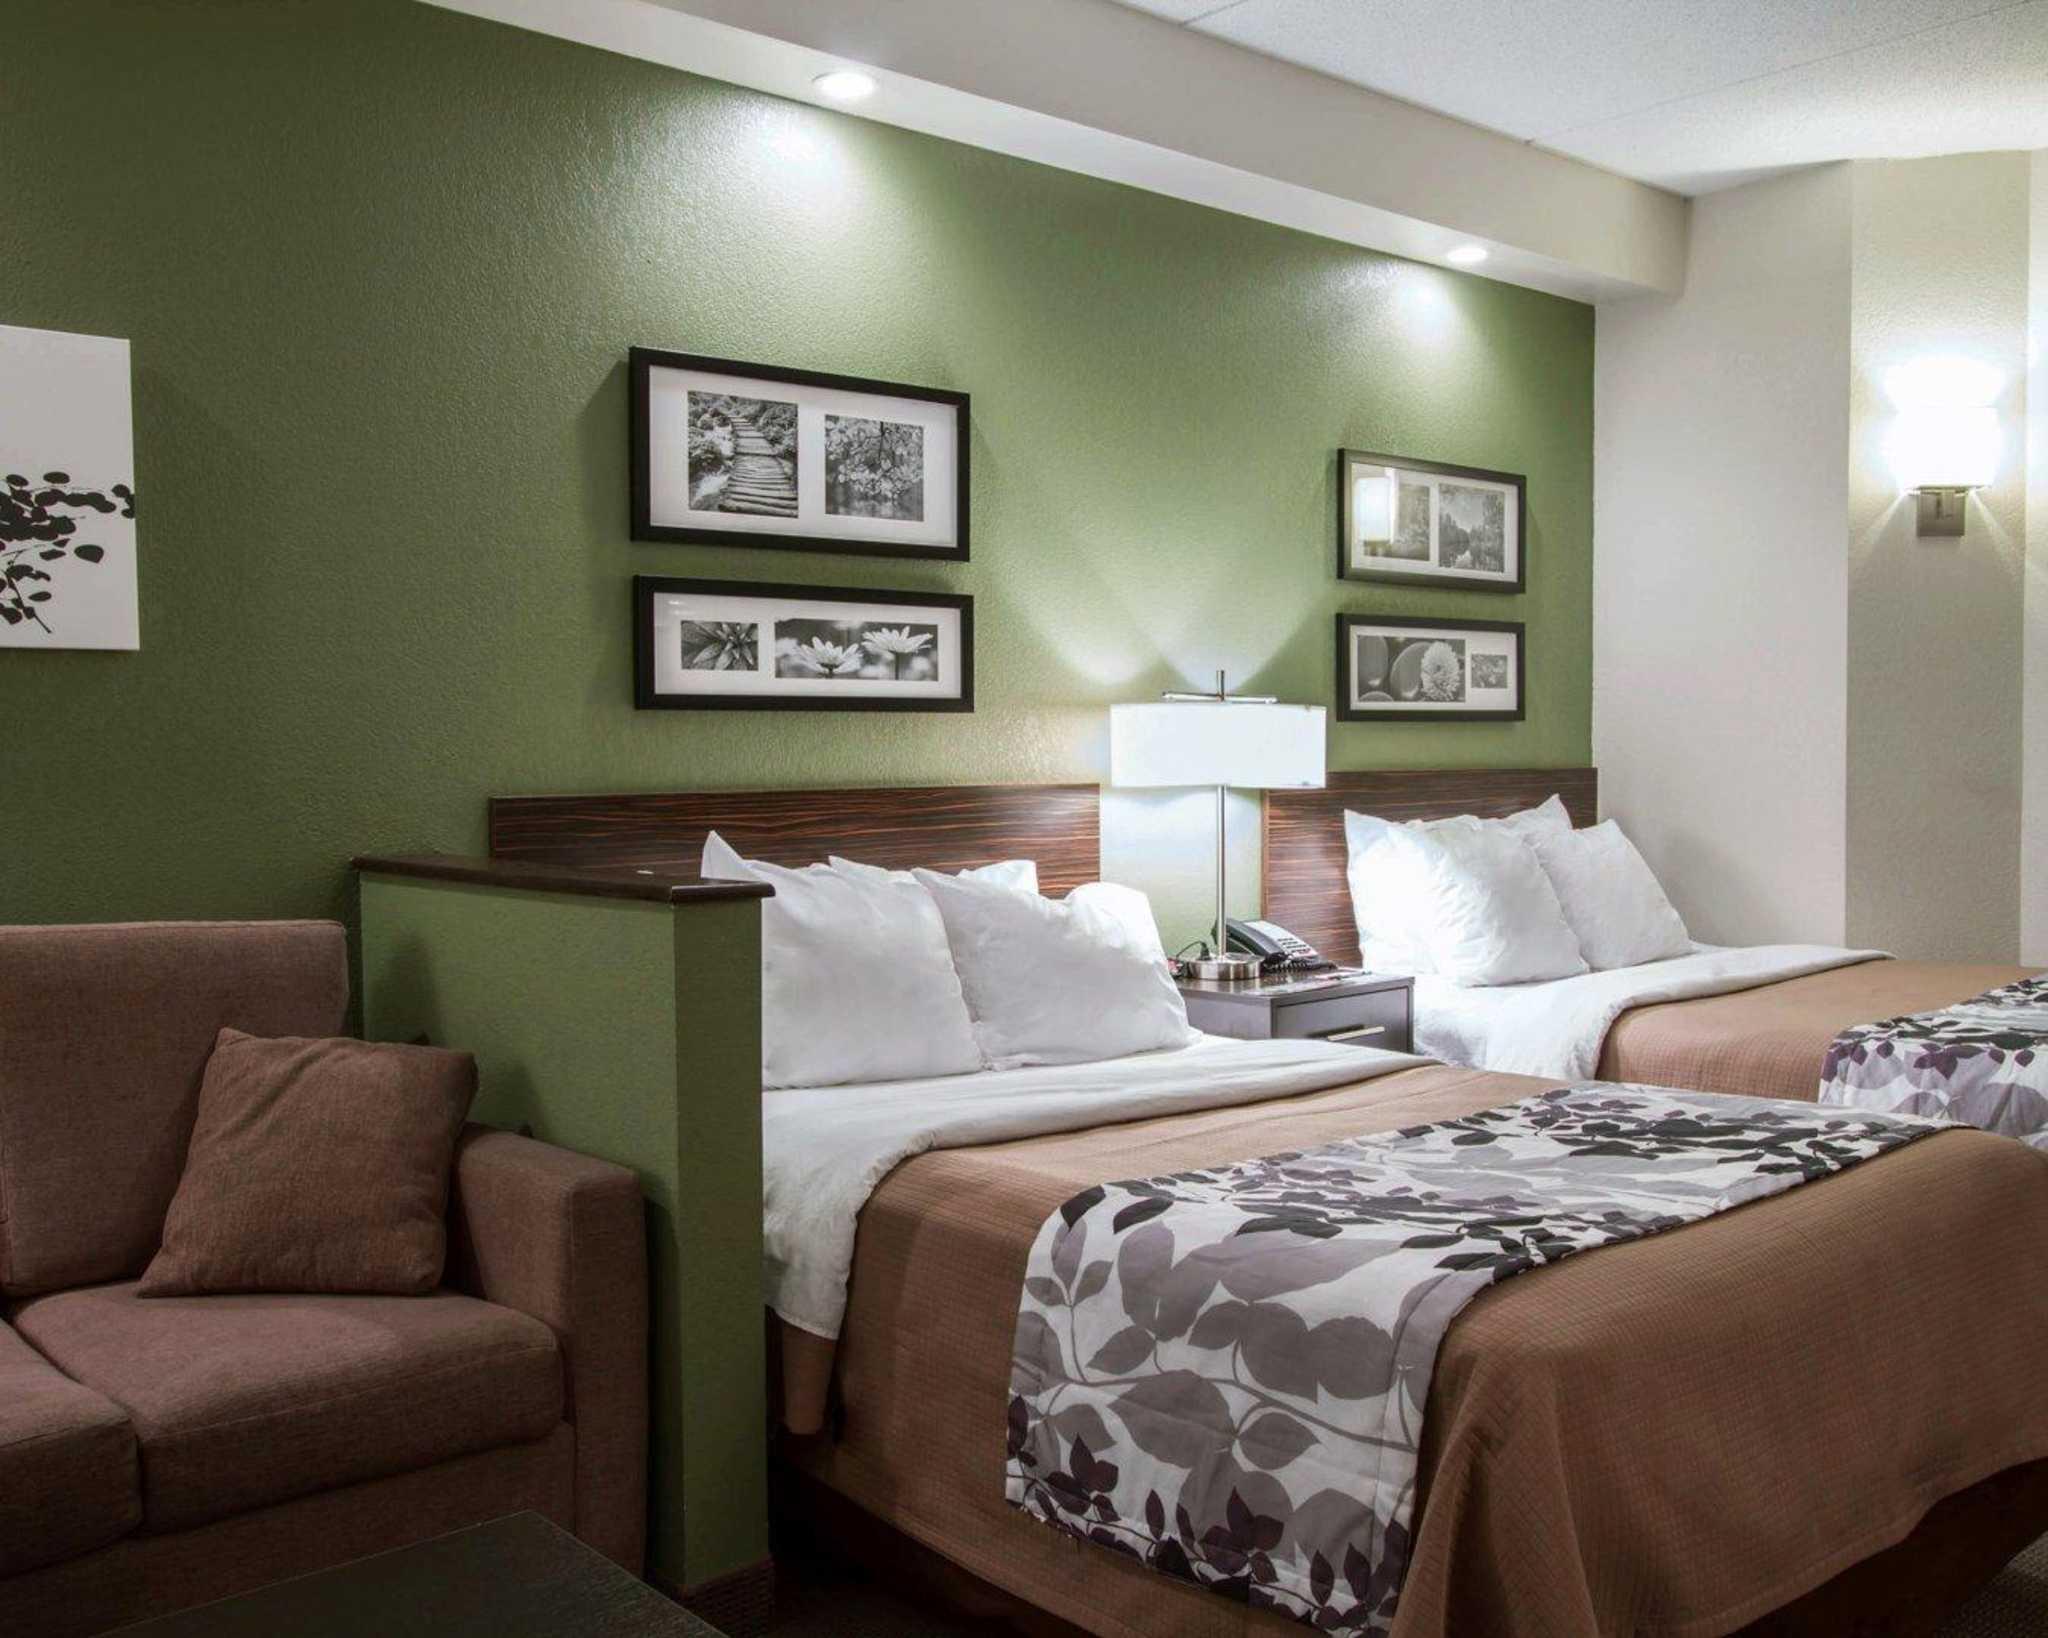 Sleep Inn & Suites Buffalo Airport image 22